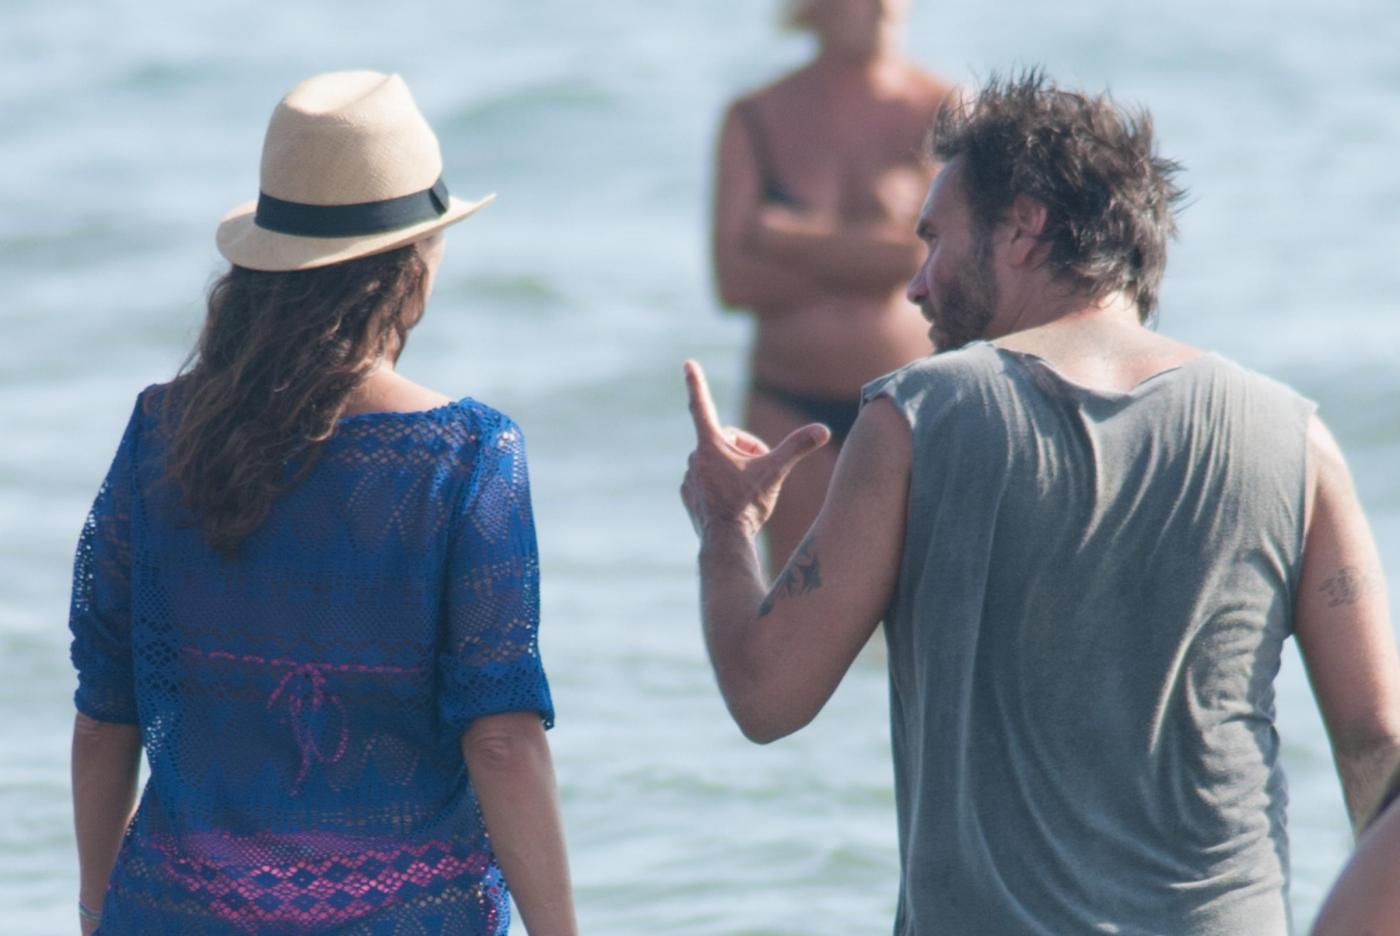 Nek e la moglie Patrizia Vacondio a Marina di Pietrasanta FOTO 16